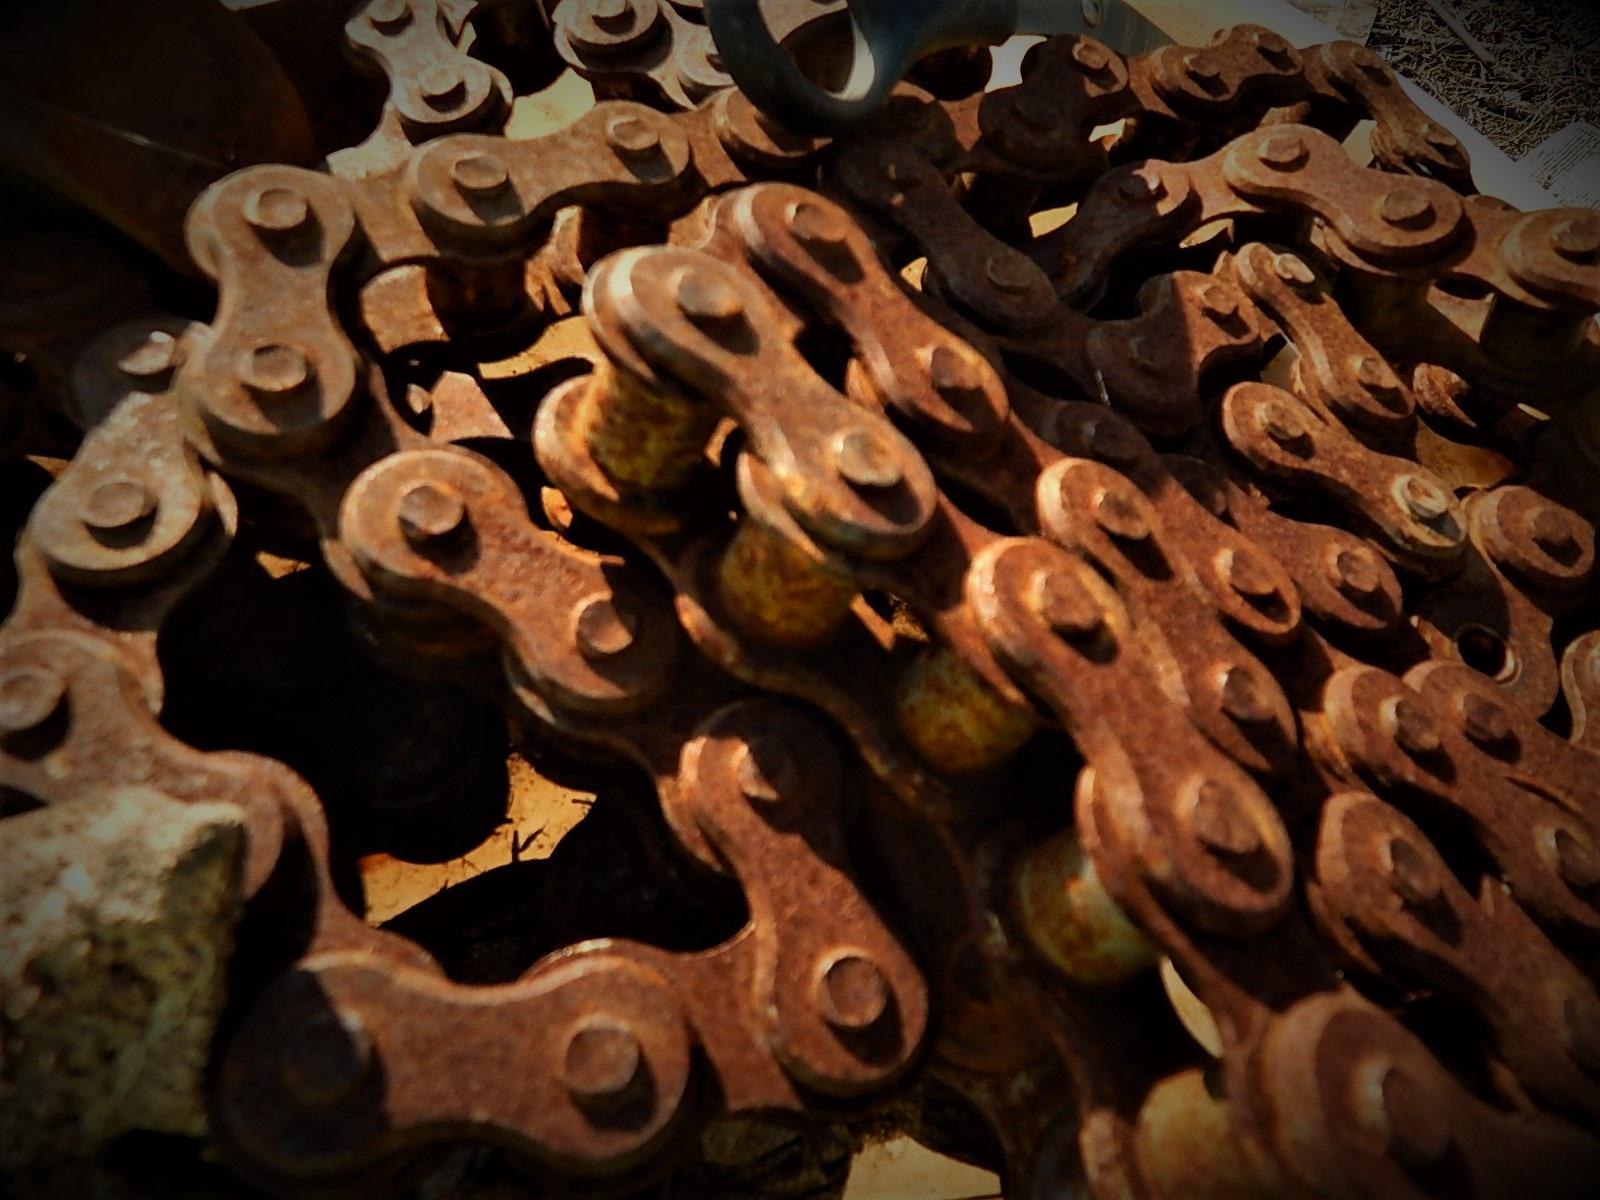 Chain by Marsha Furman